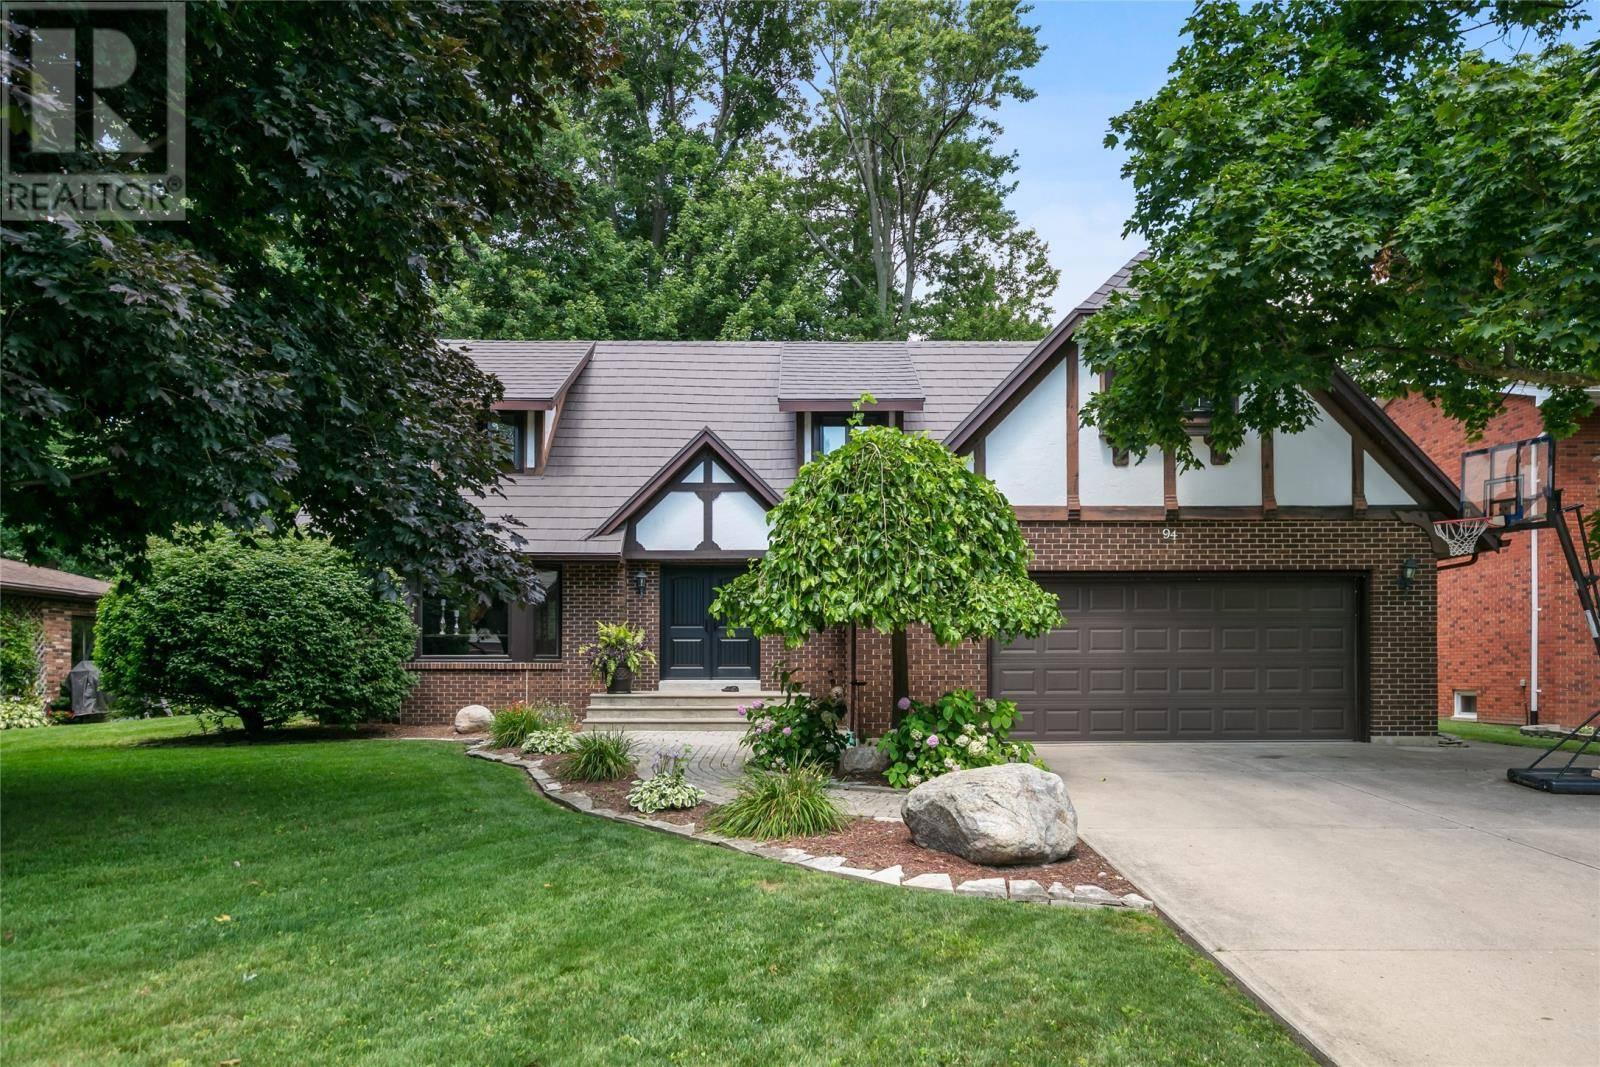 House for sale at 94 Kingswood  Kingsville Ontario - MLS: 19023001